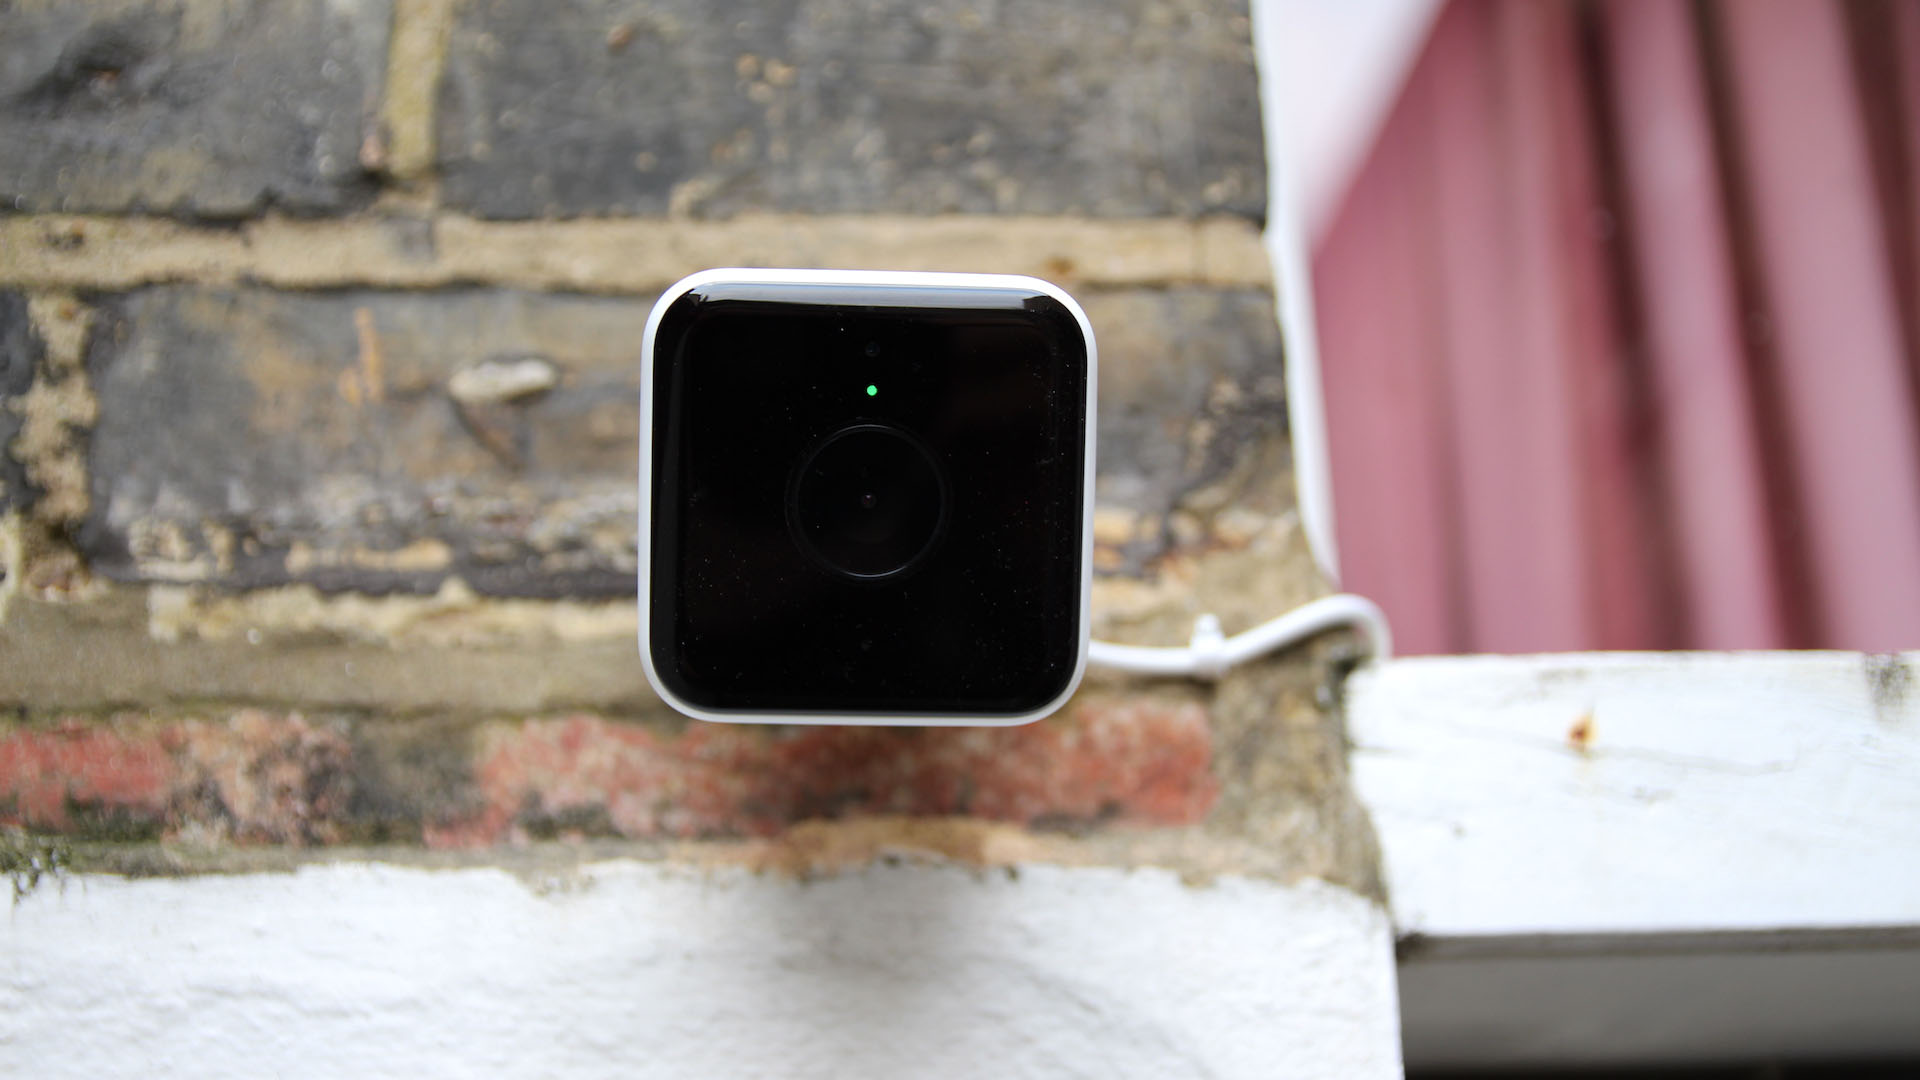 Hive View Outdoor camera review | TechRadar